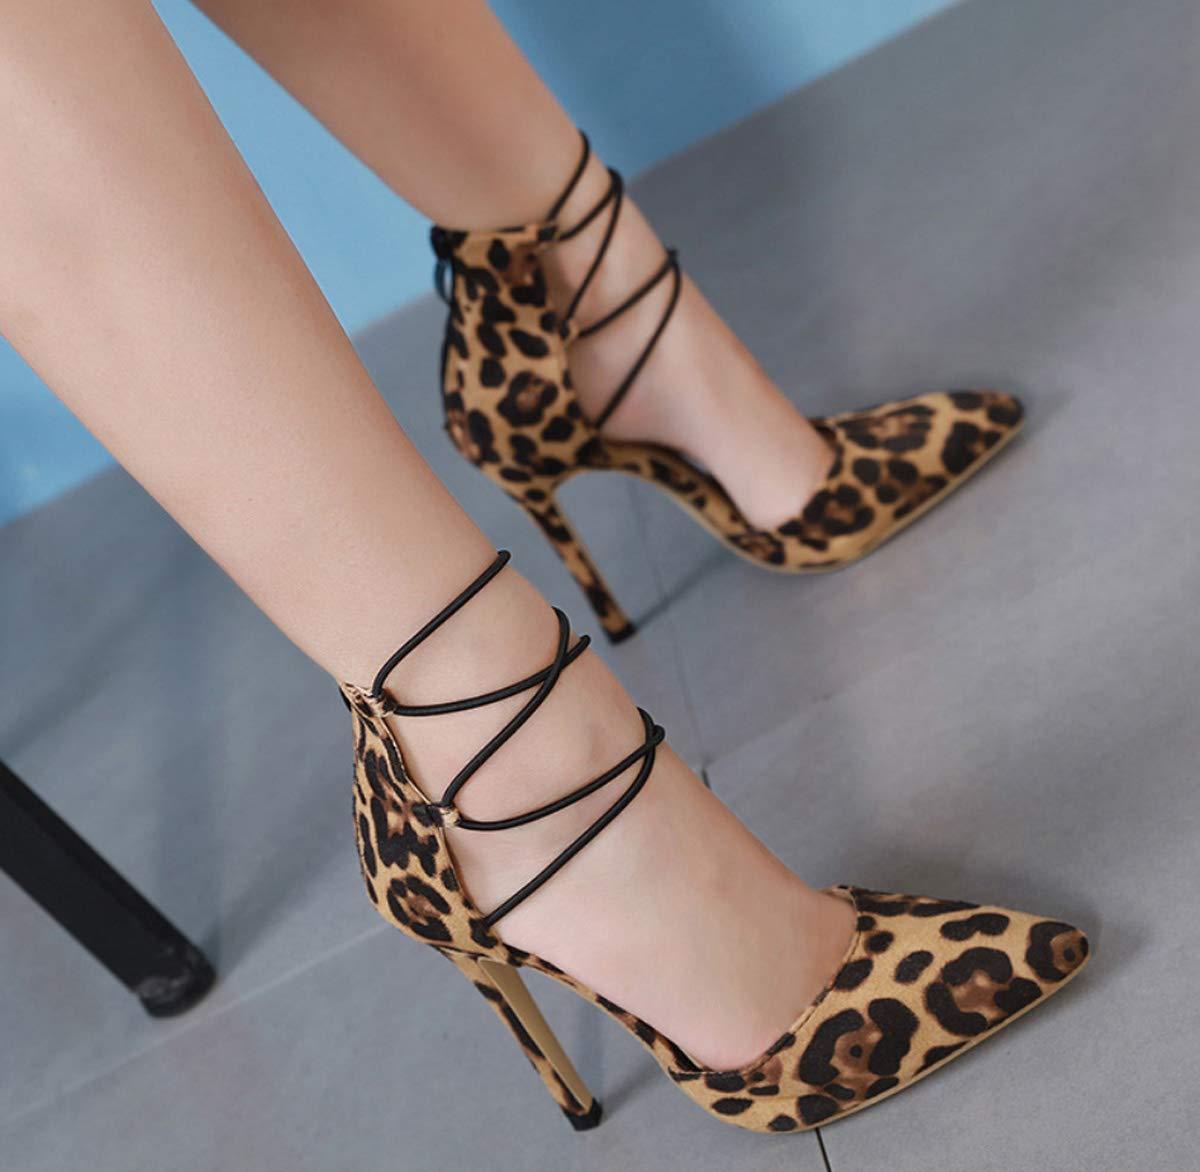 DANDANJIE Frauen High Heel Gericht Gericht Gericht Schuhe Spitz Leopardenmuster Pfennigabsatz Reißverschluss Schuhe Büro Hochzeit d5509a